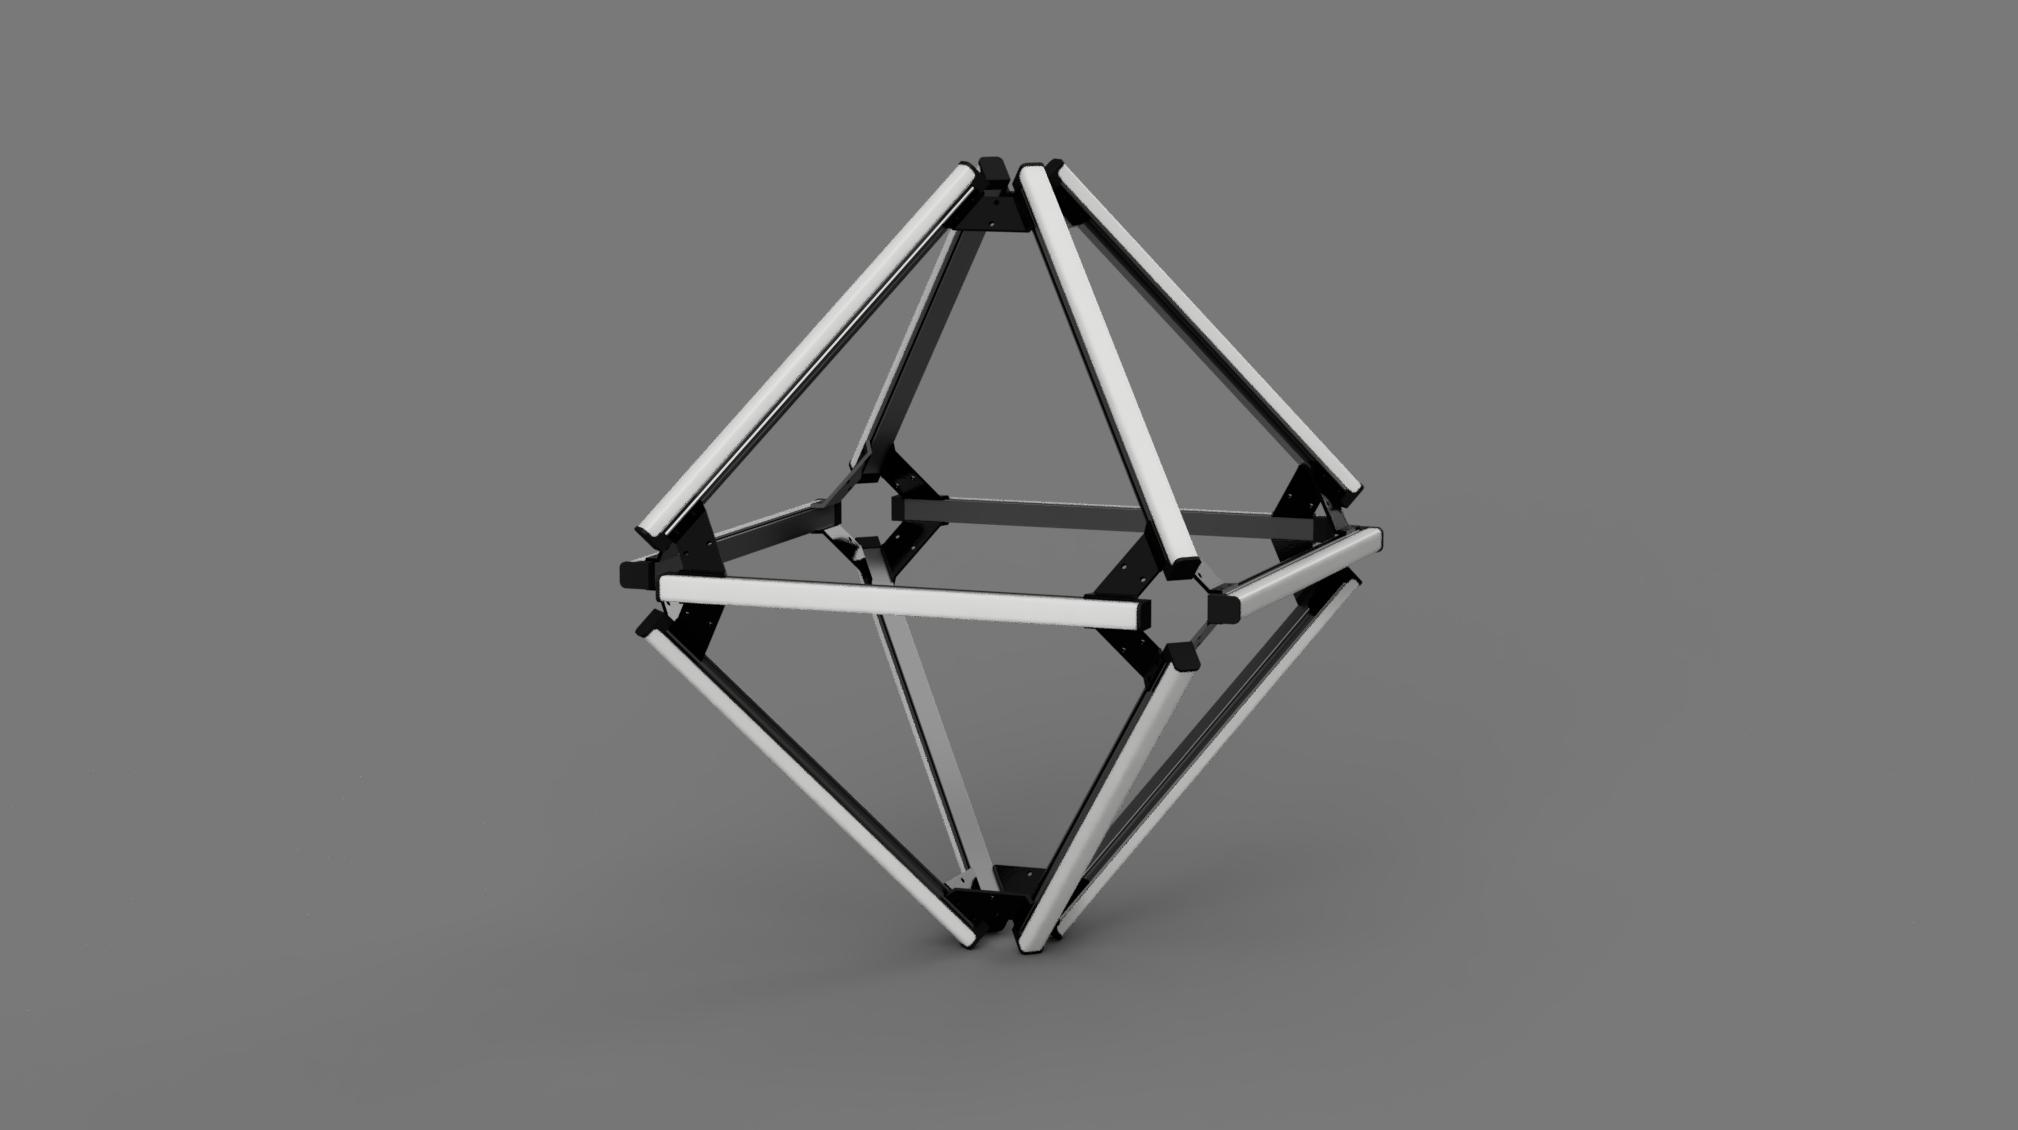 octahedron platonic solid